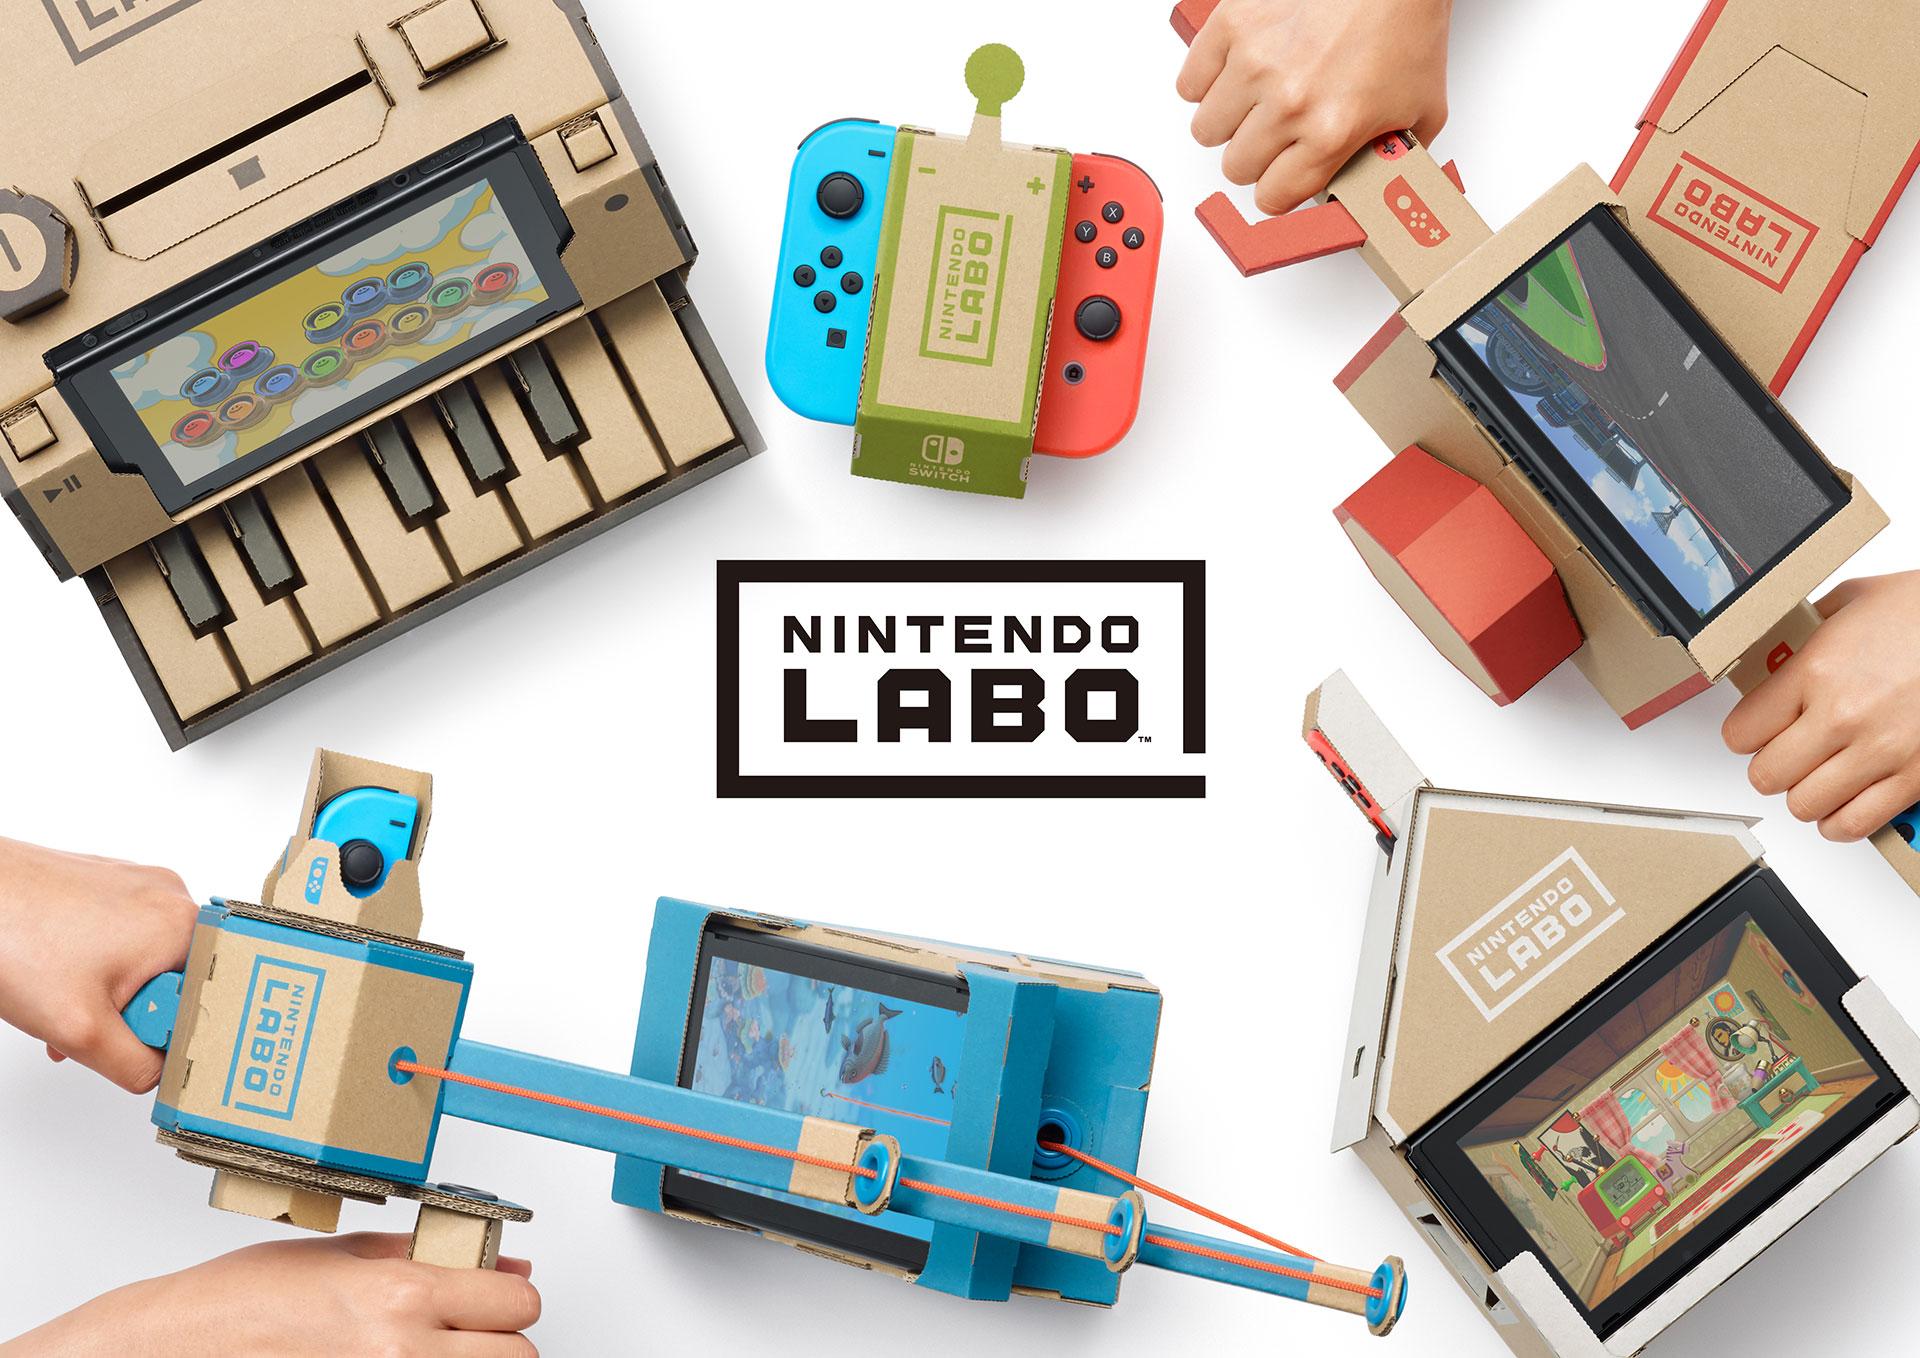 Por que eu acho o Nintendo Labo interessante